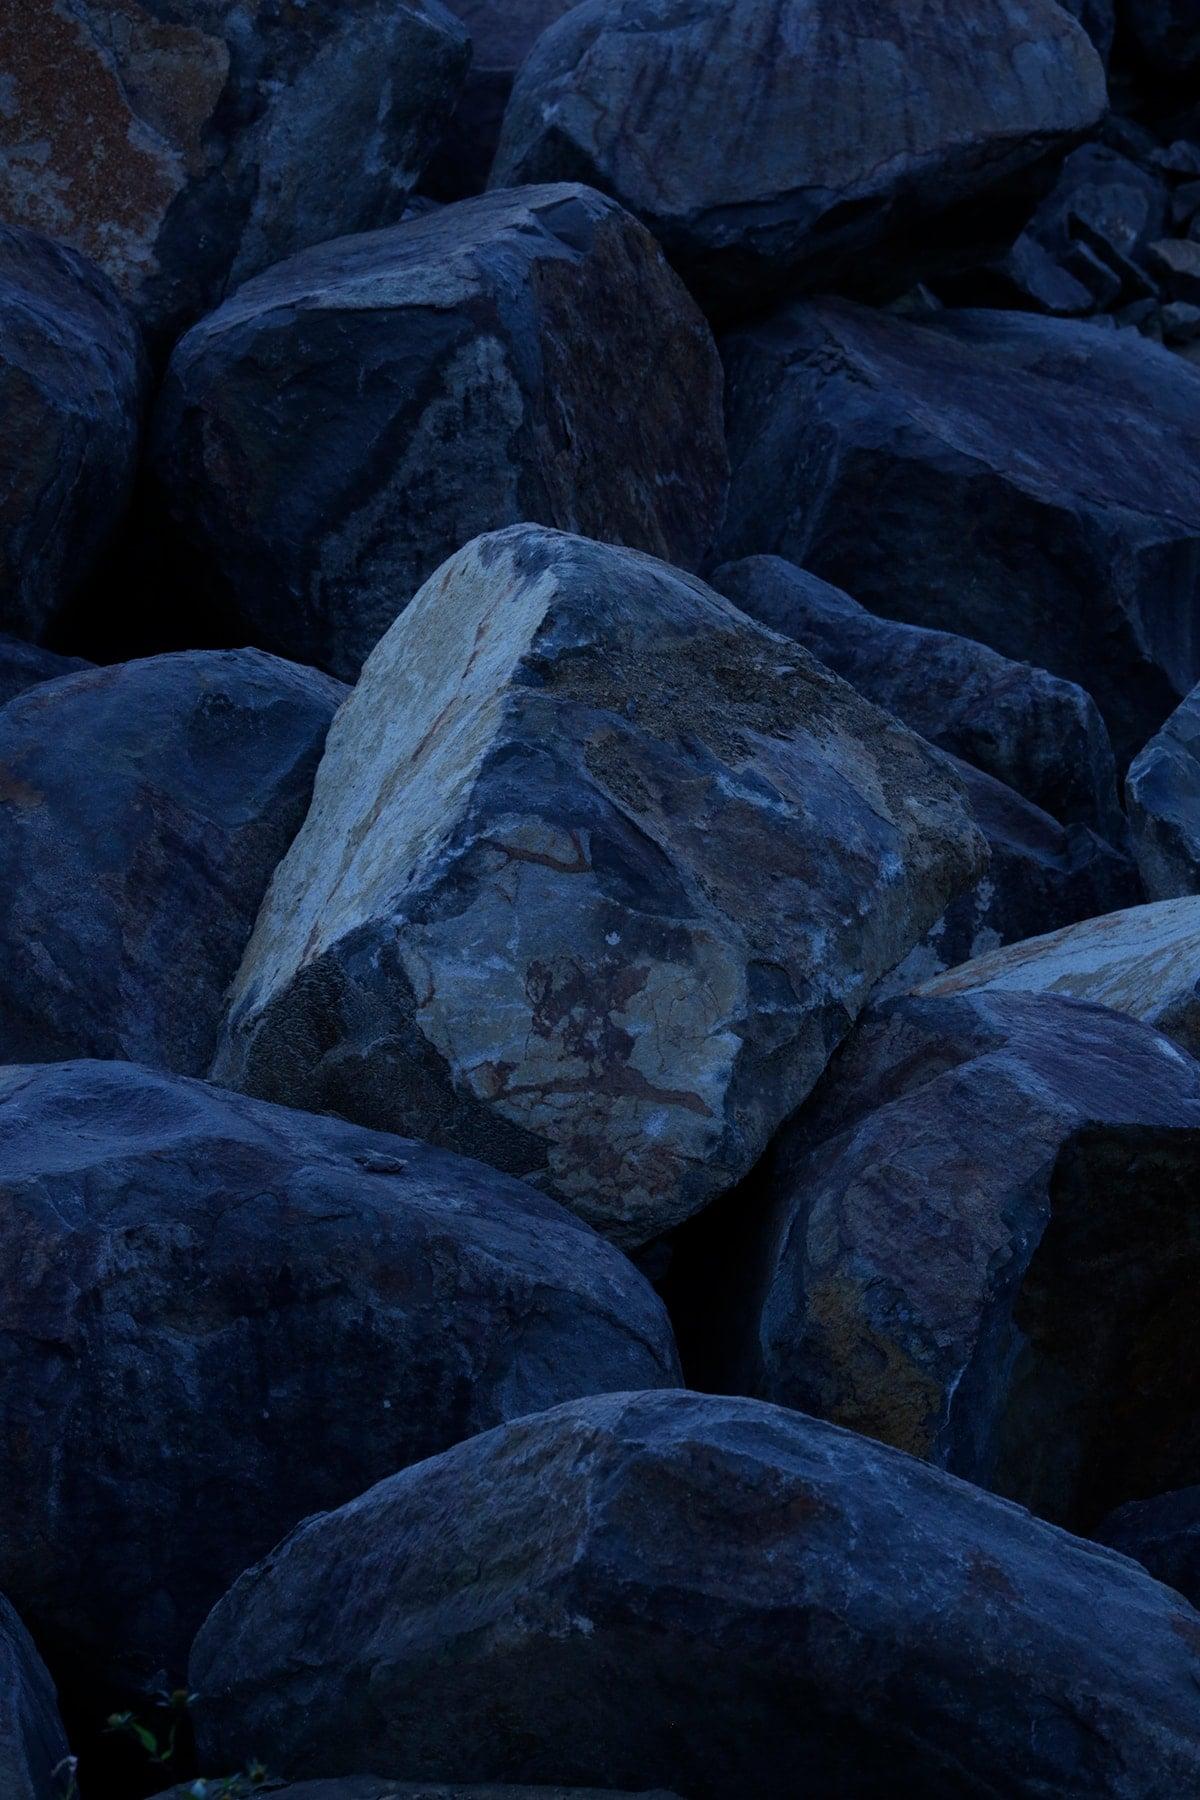 KASHIYAMA DAIKANYAMA ×大蔵山スタジオ 伊達冠石のプロダクトを展示。